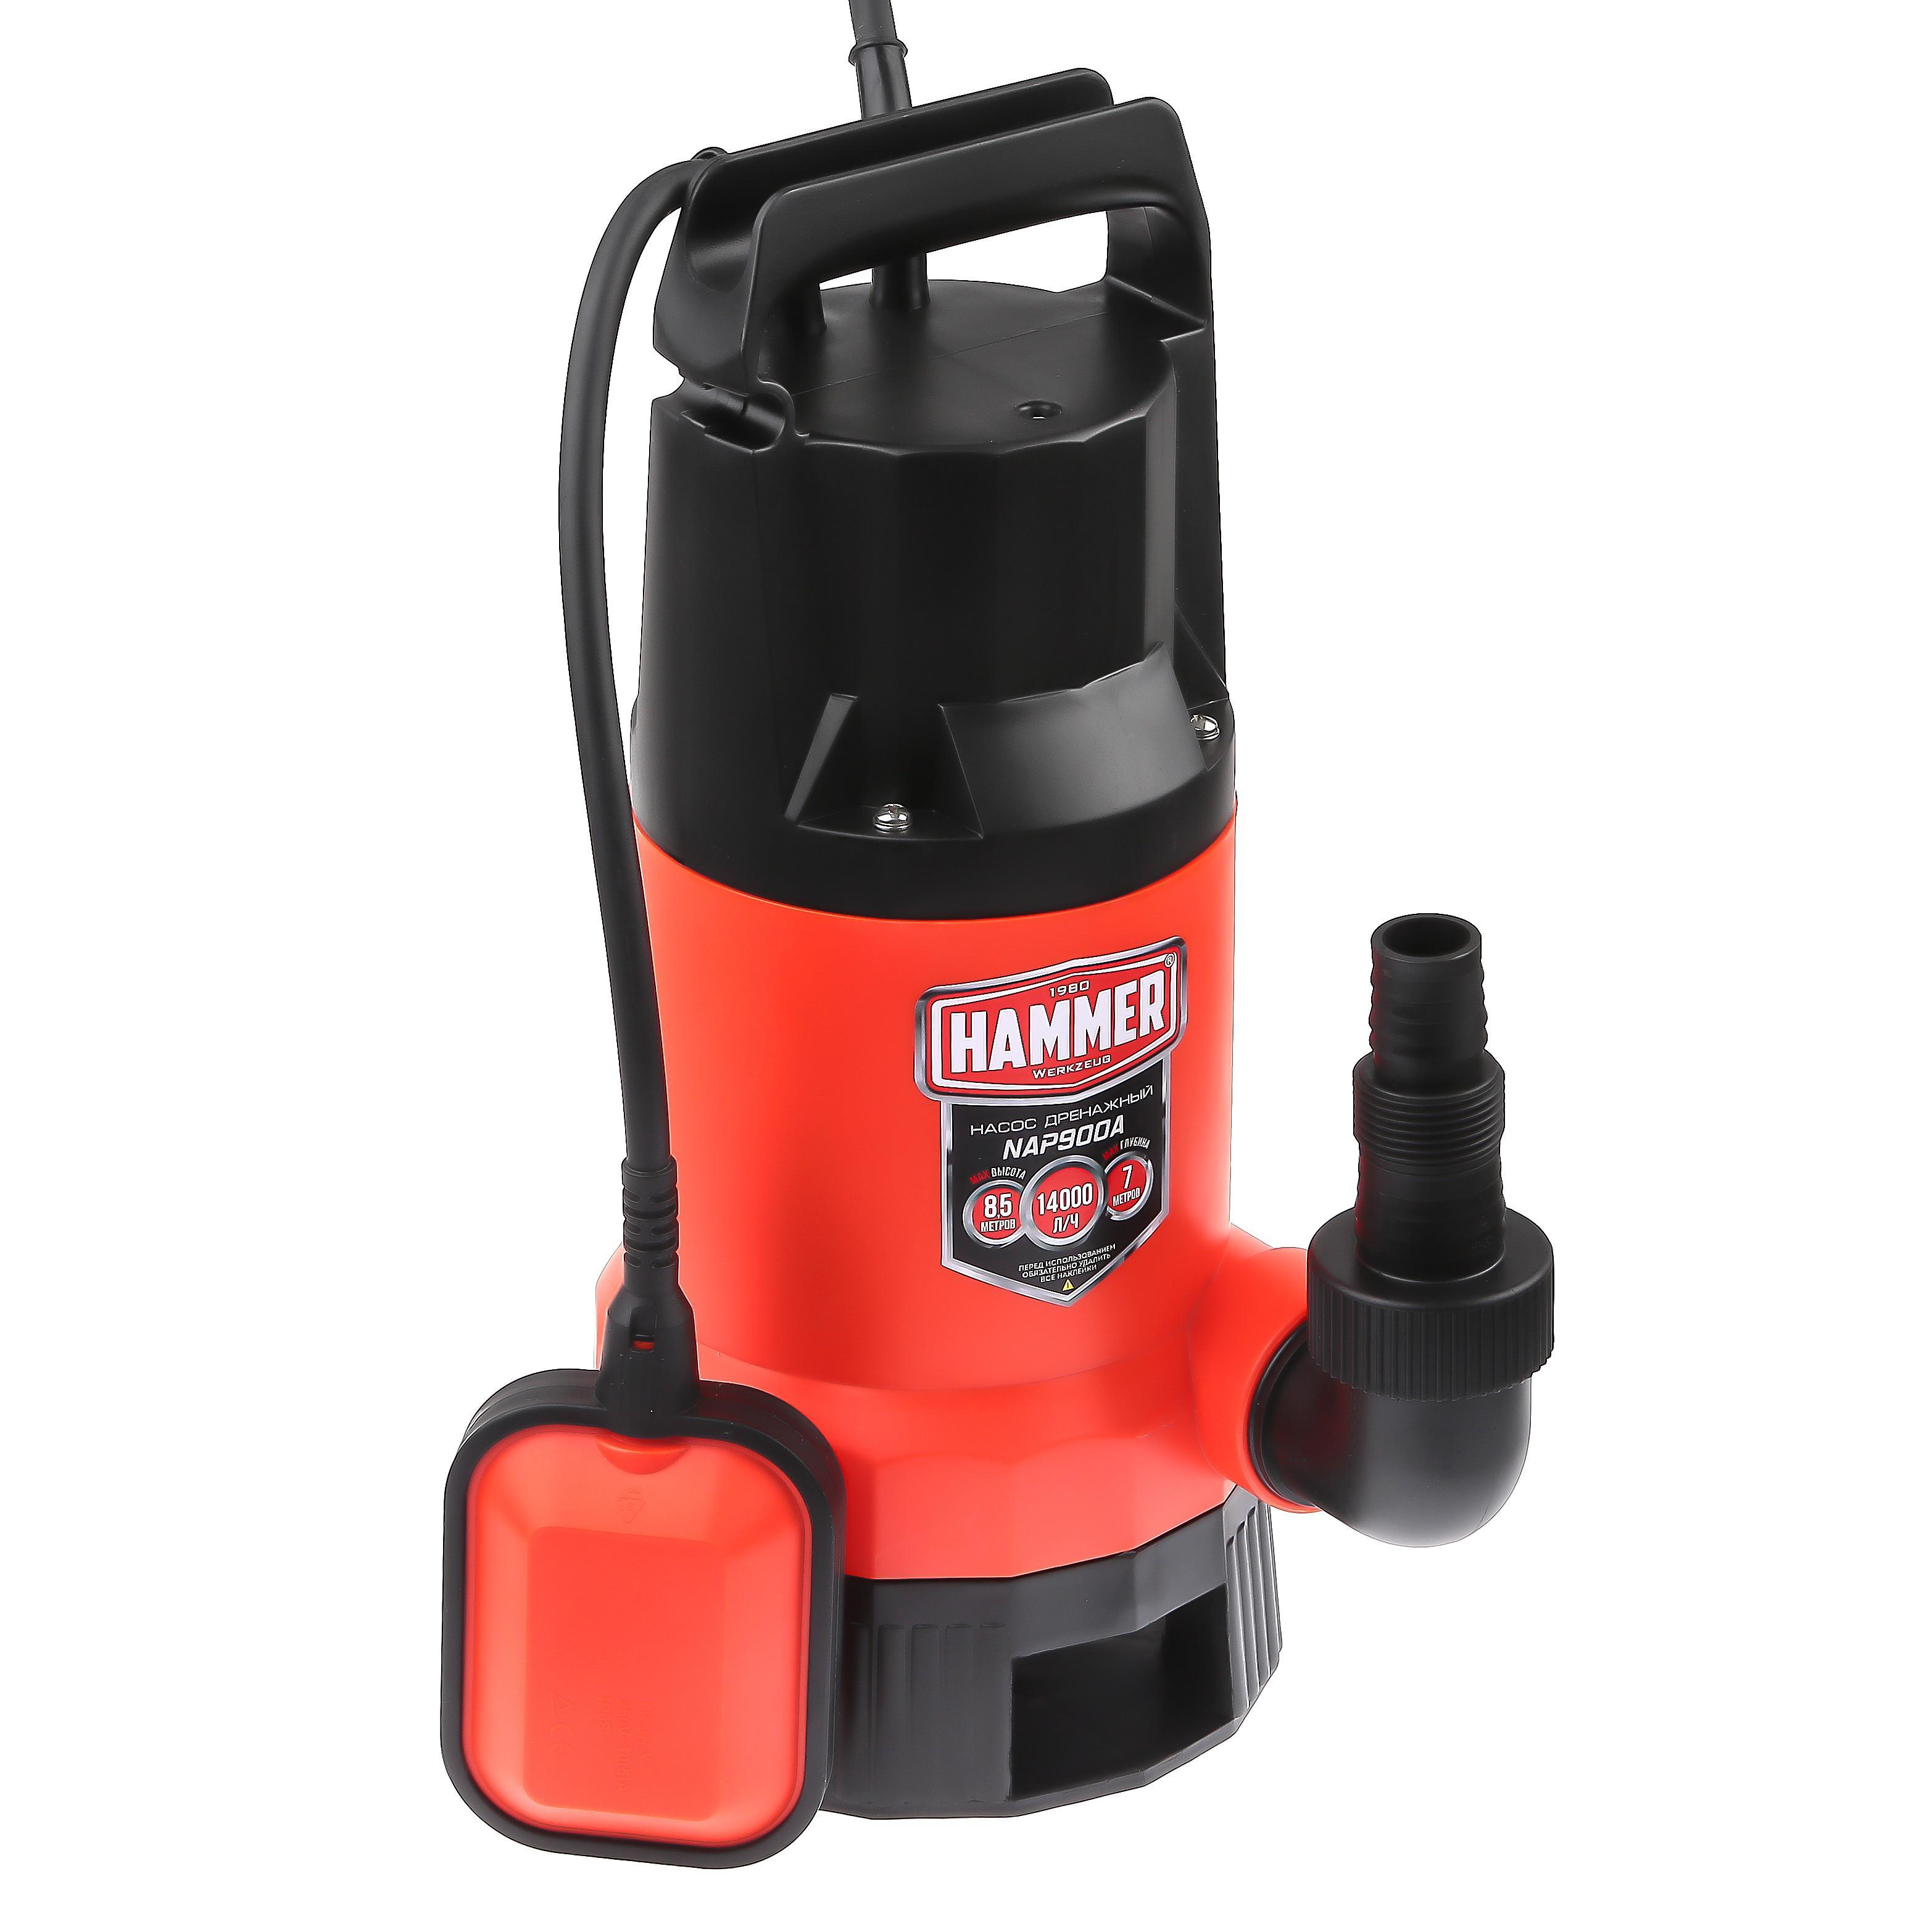 Дренажный насос Hammer Nap900a цена